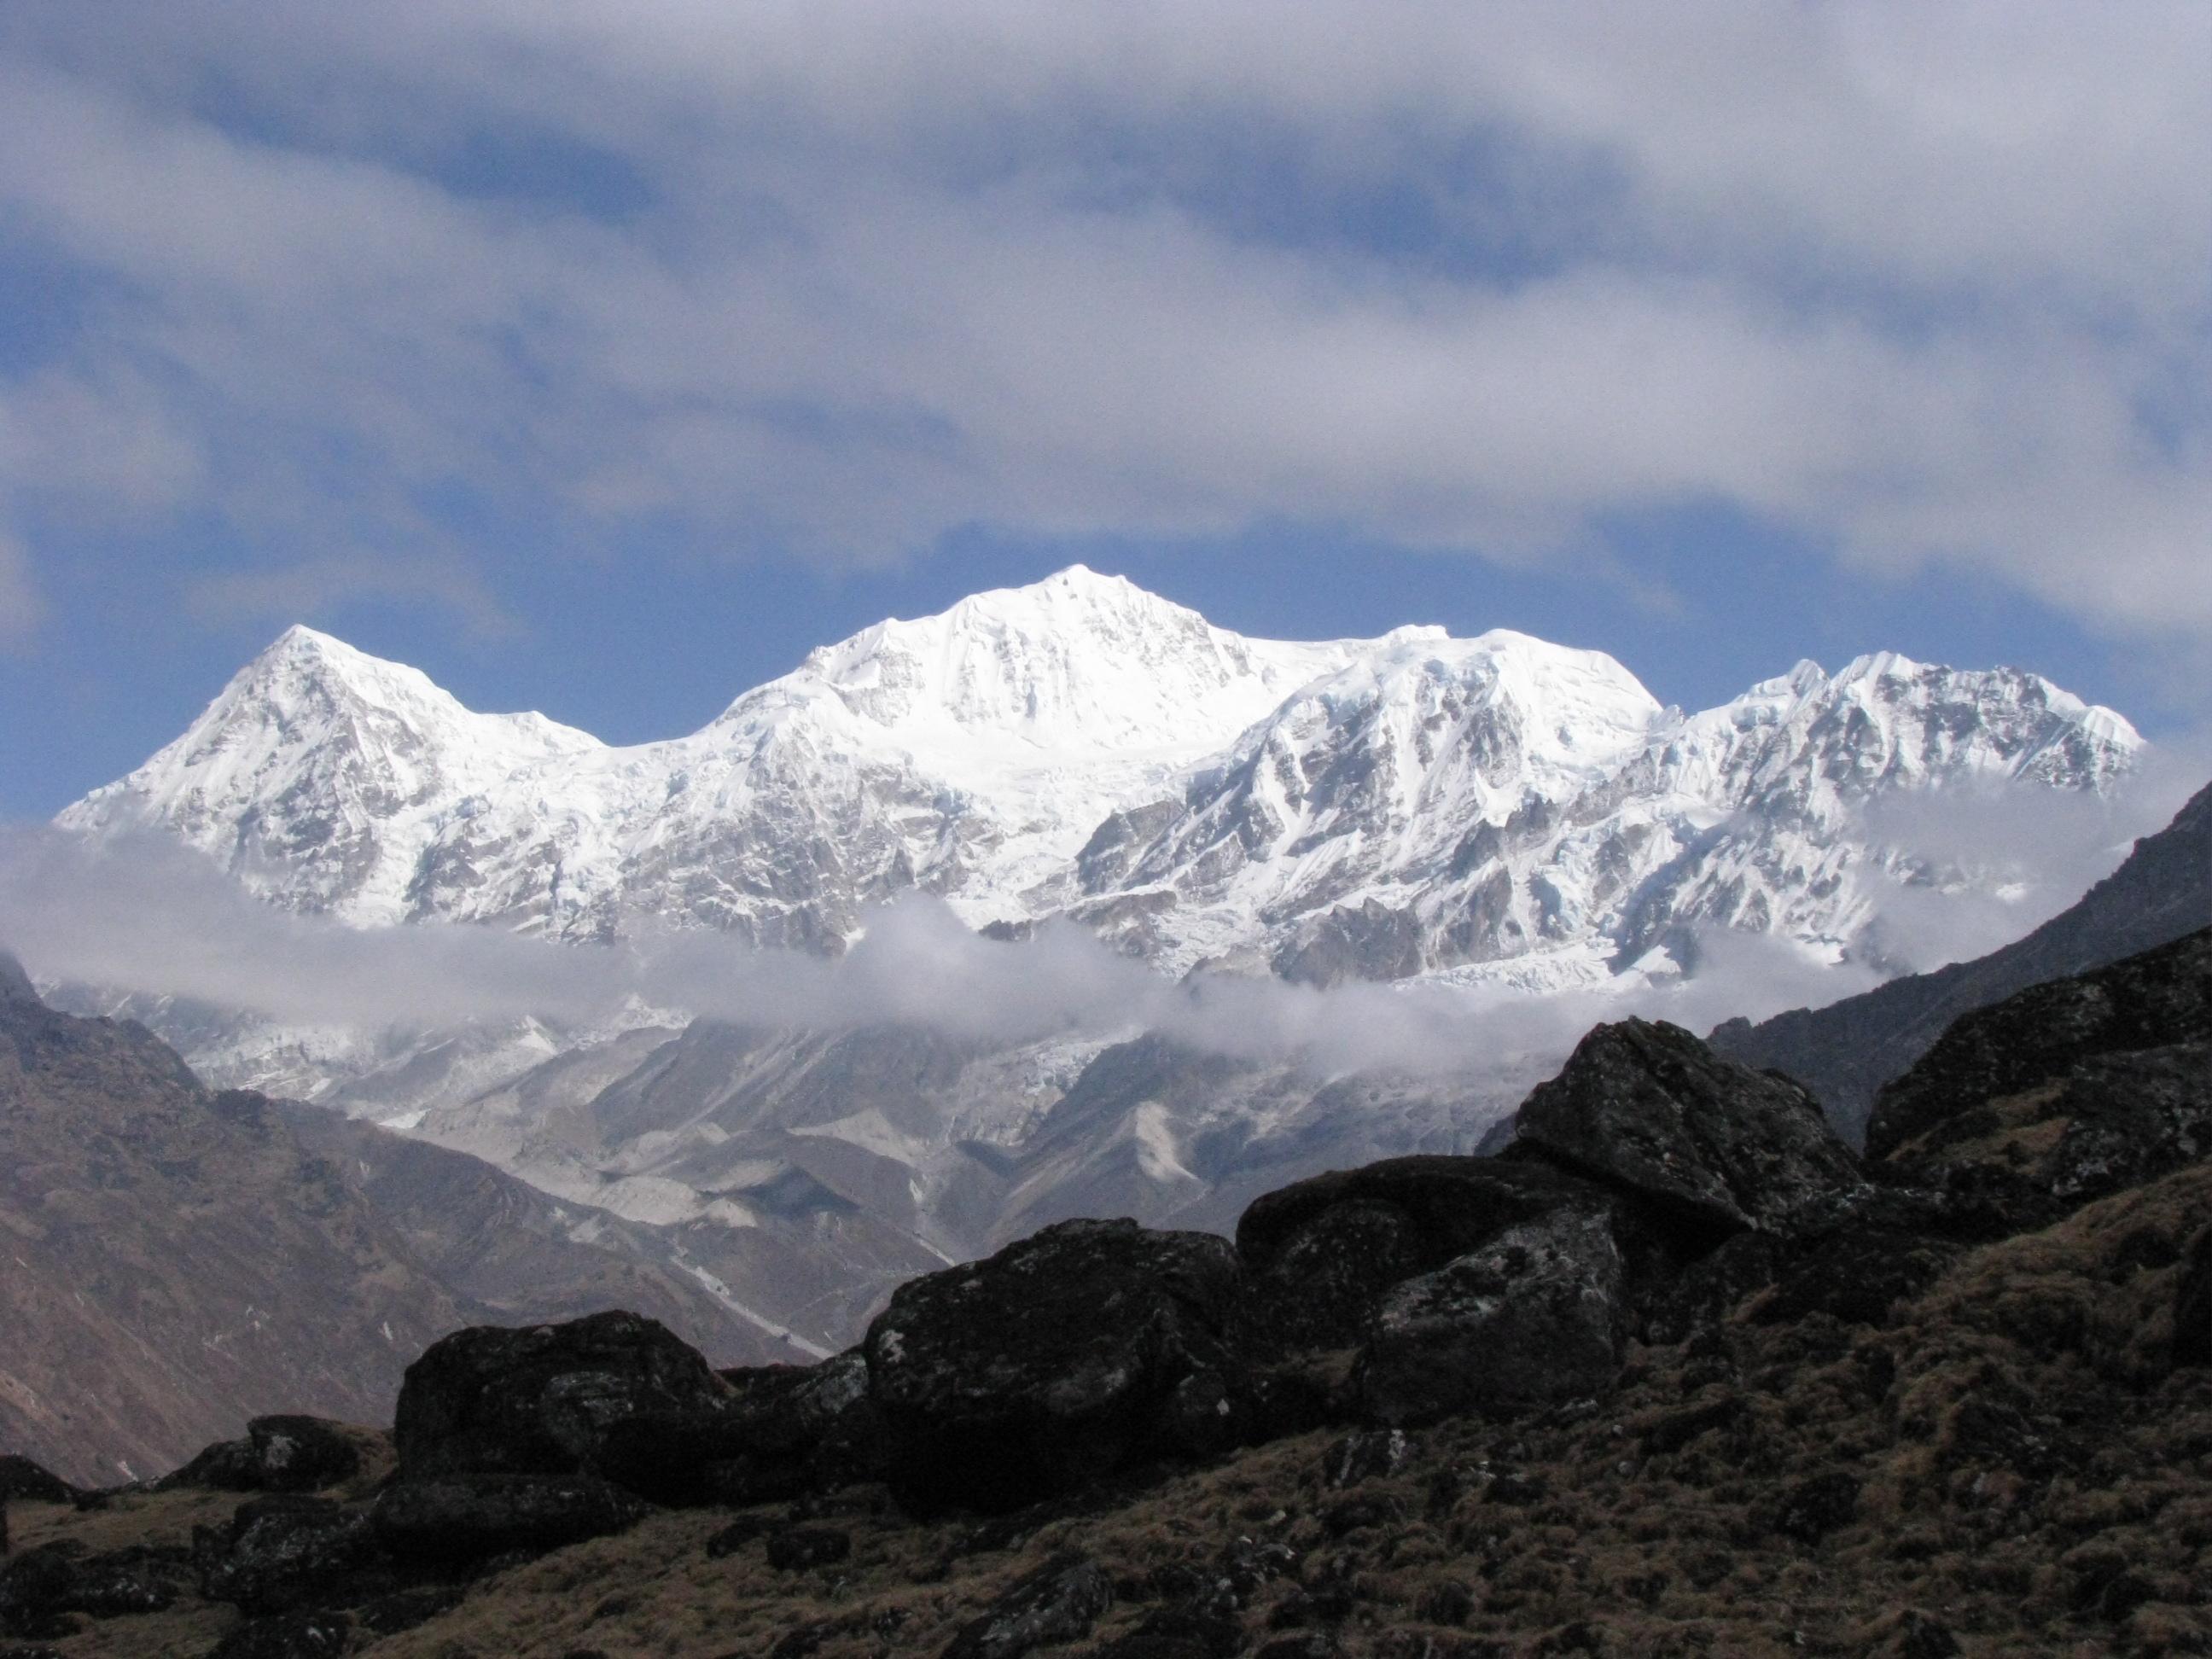 Basic Mountaineering Course – HMI, Darjeeling, INDIA